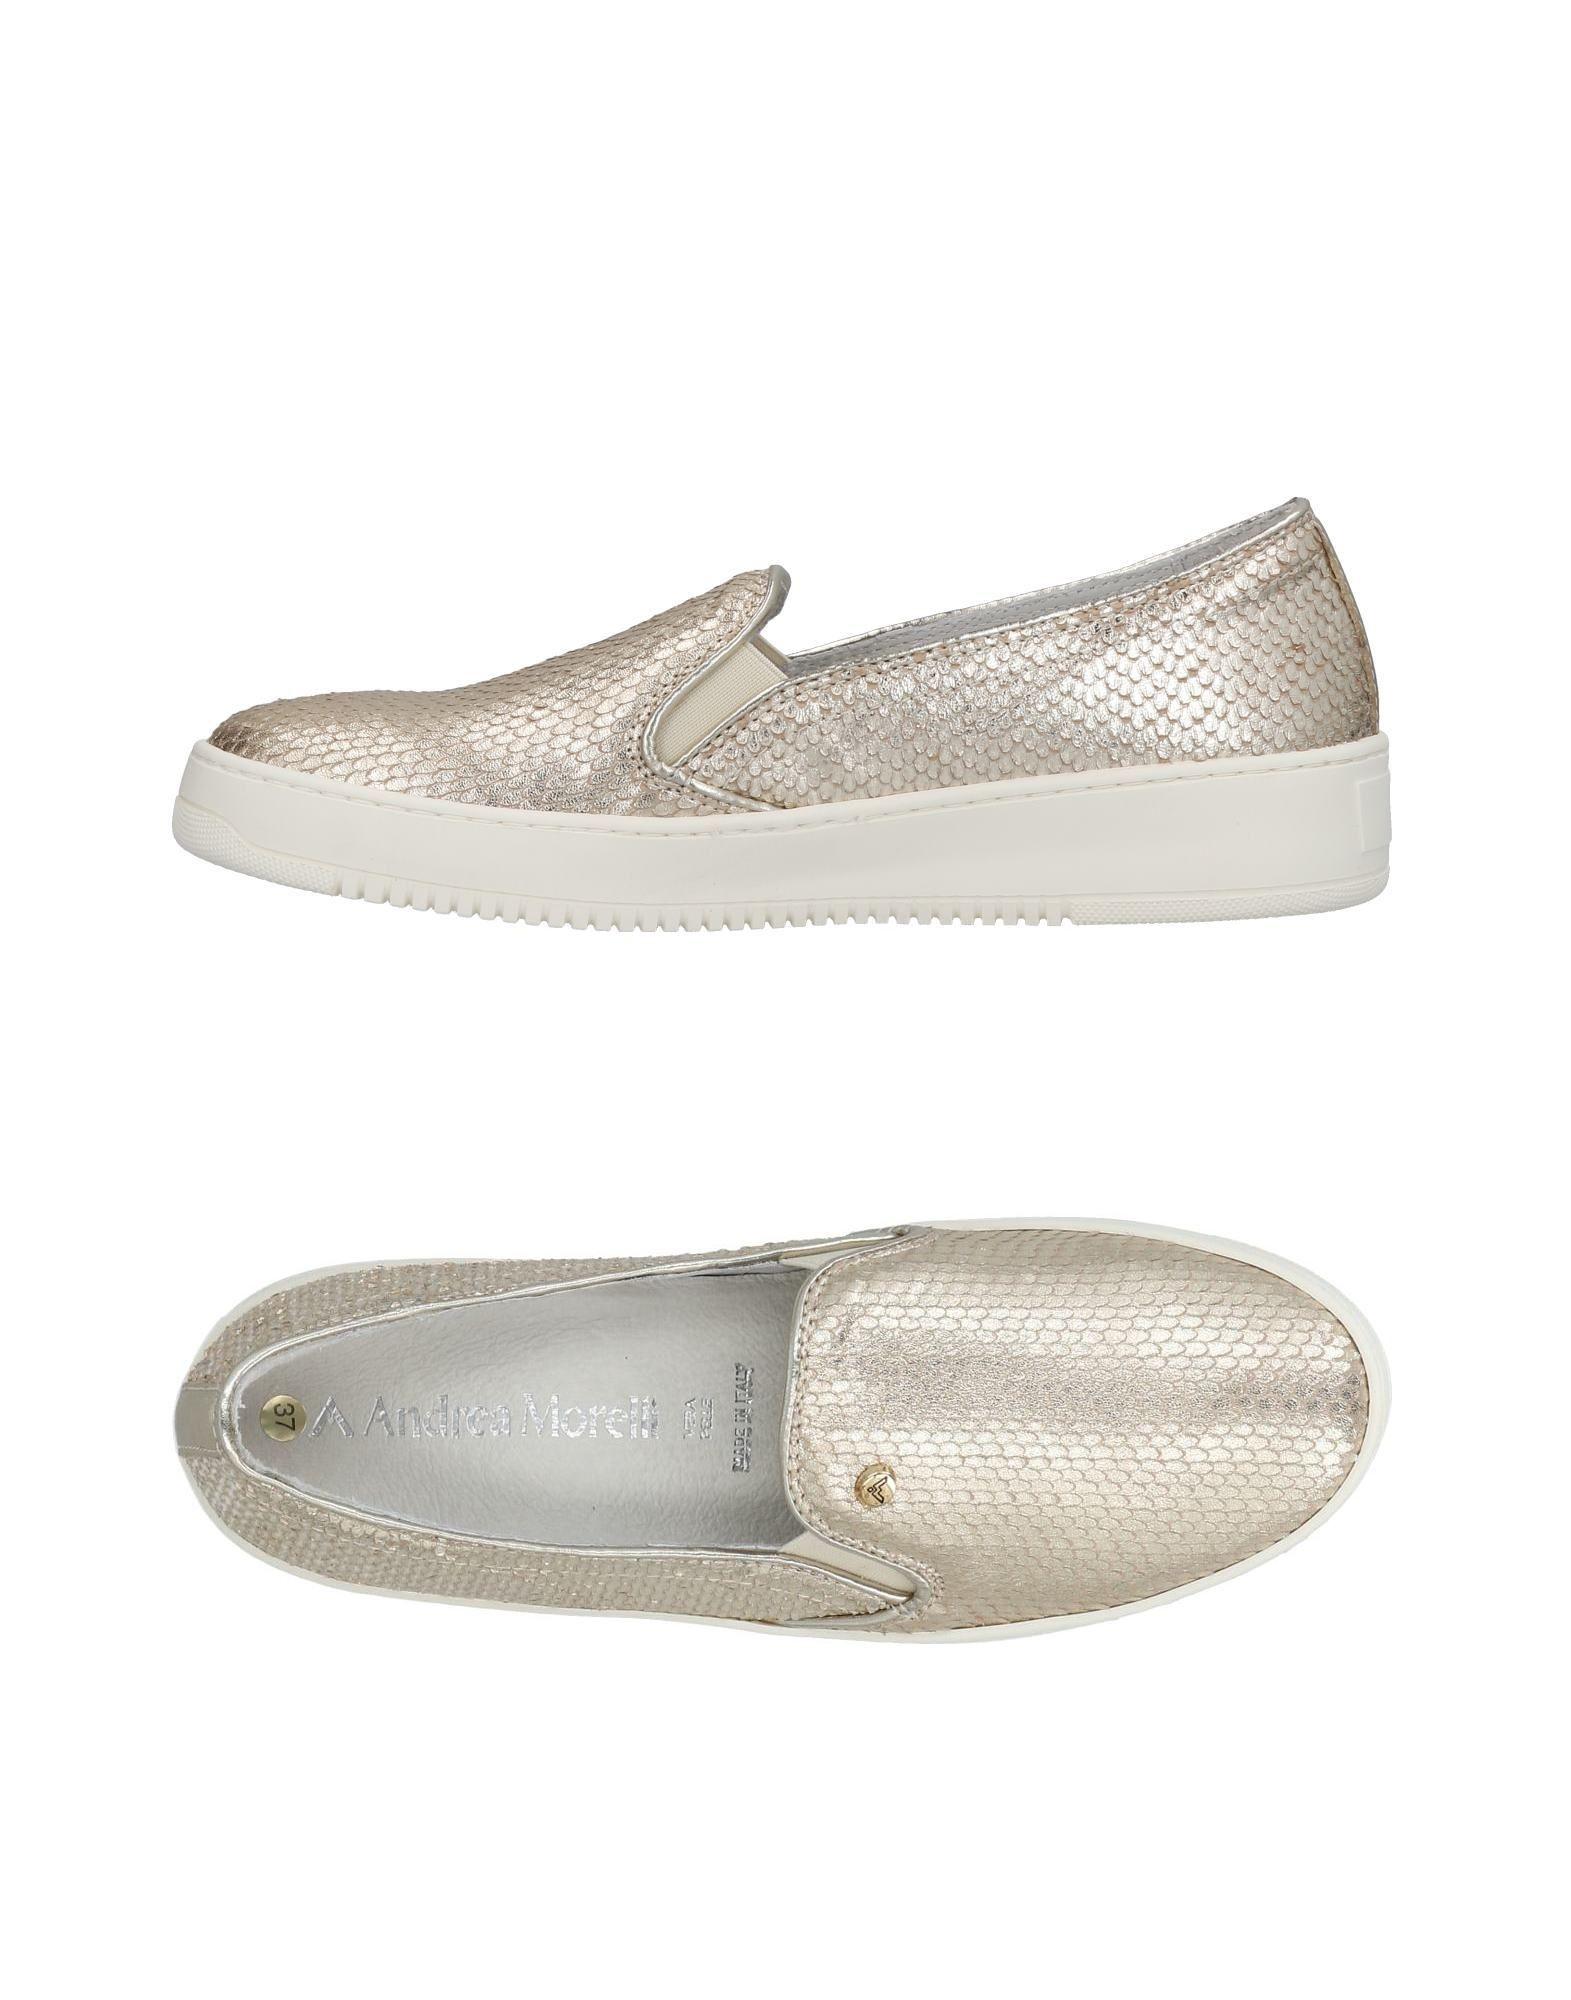 Sneakers Andrea Morelli Donna - 11190700KC